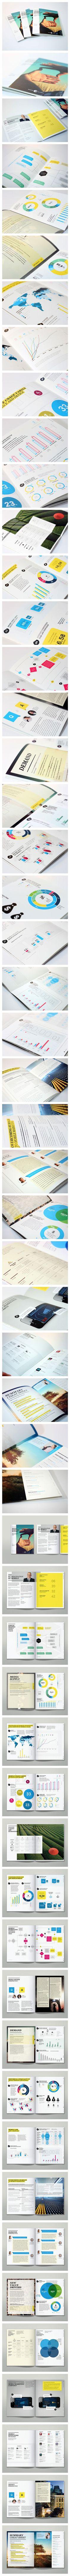 data layout Magna Media Economy Report on behance Design Brochure, Booklet Design, Brochure Layout, Graphic Design Layouts, Graphic Design Print, Graphic Design Branding, Graphic Design Inspiration, Layout Design, Editorial Design